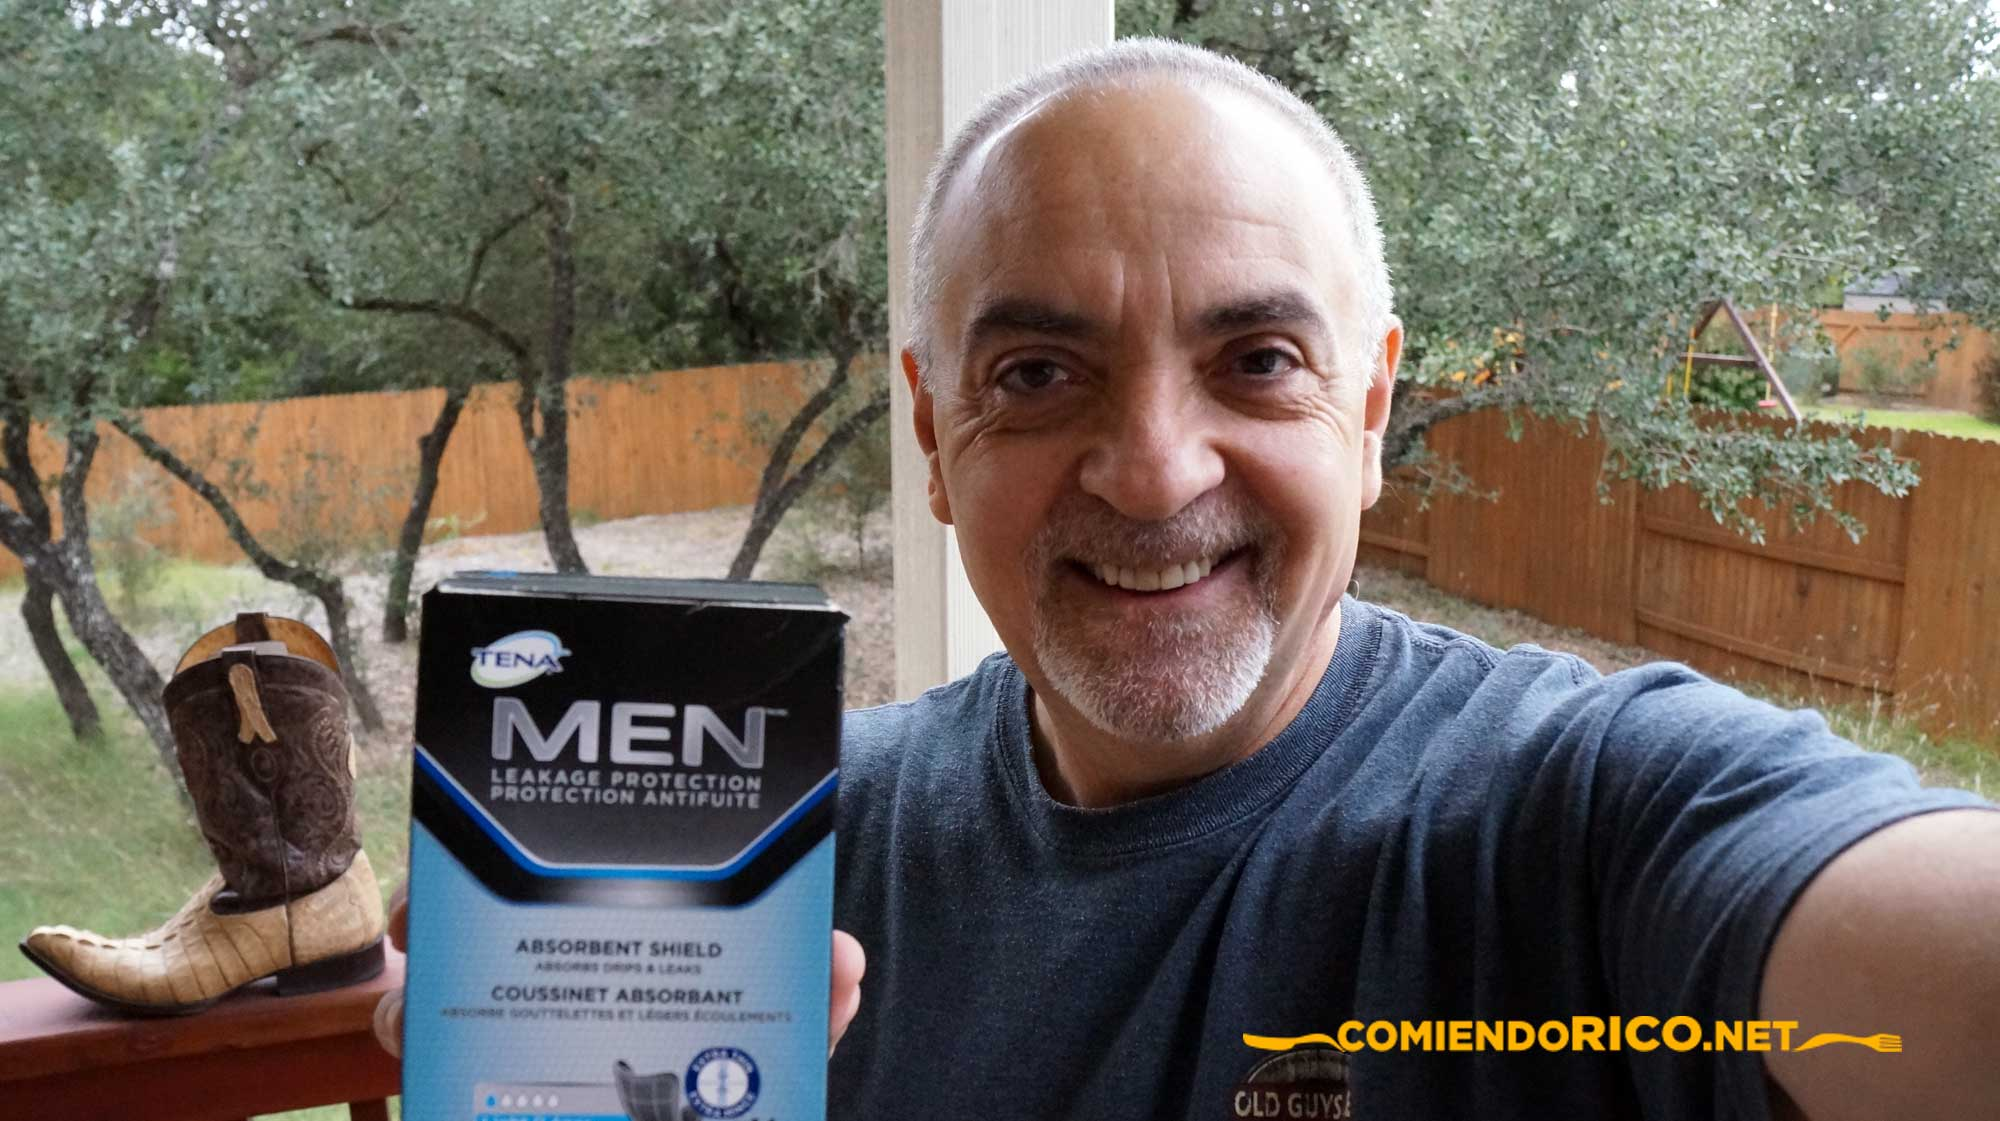 TENA® MEN™ Protective Shield, incontinencia urinaria